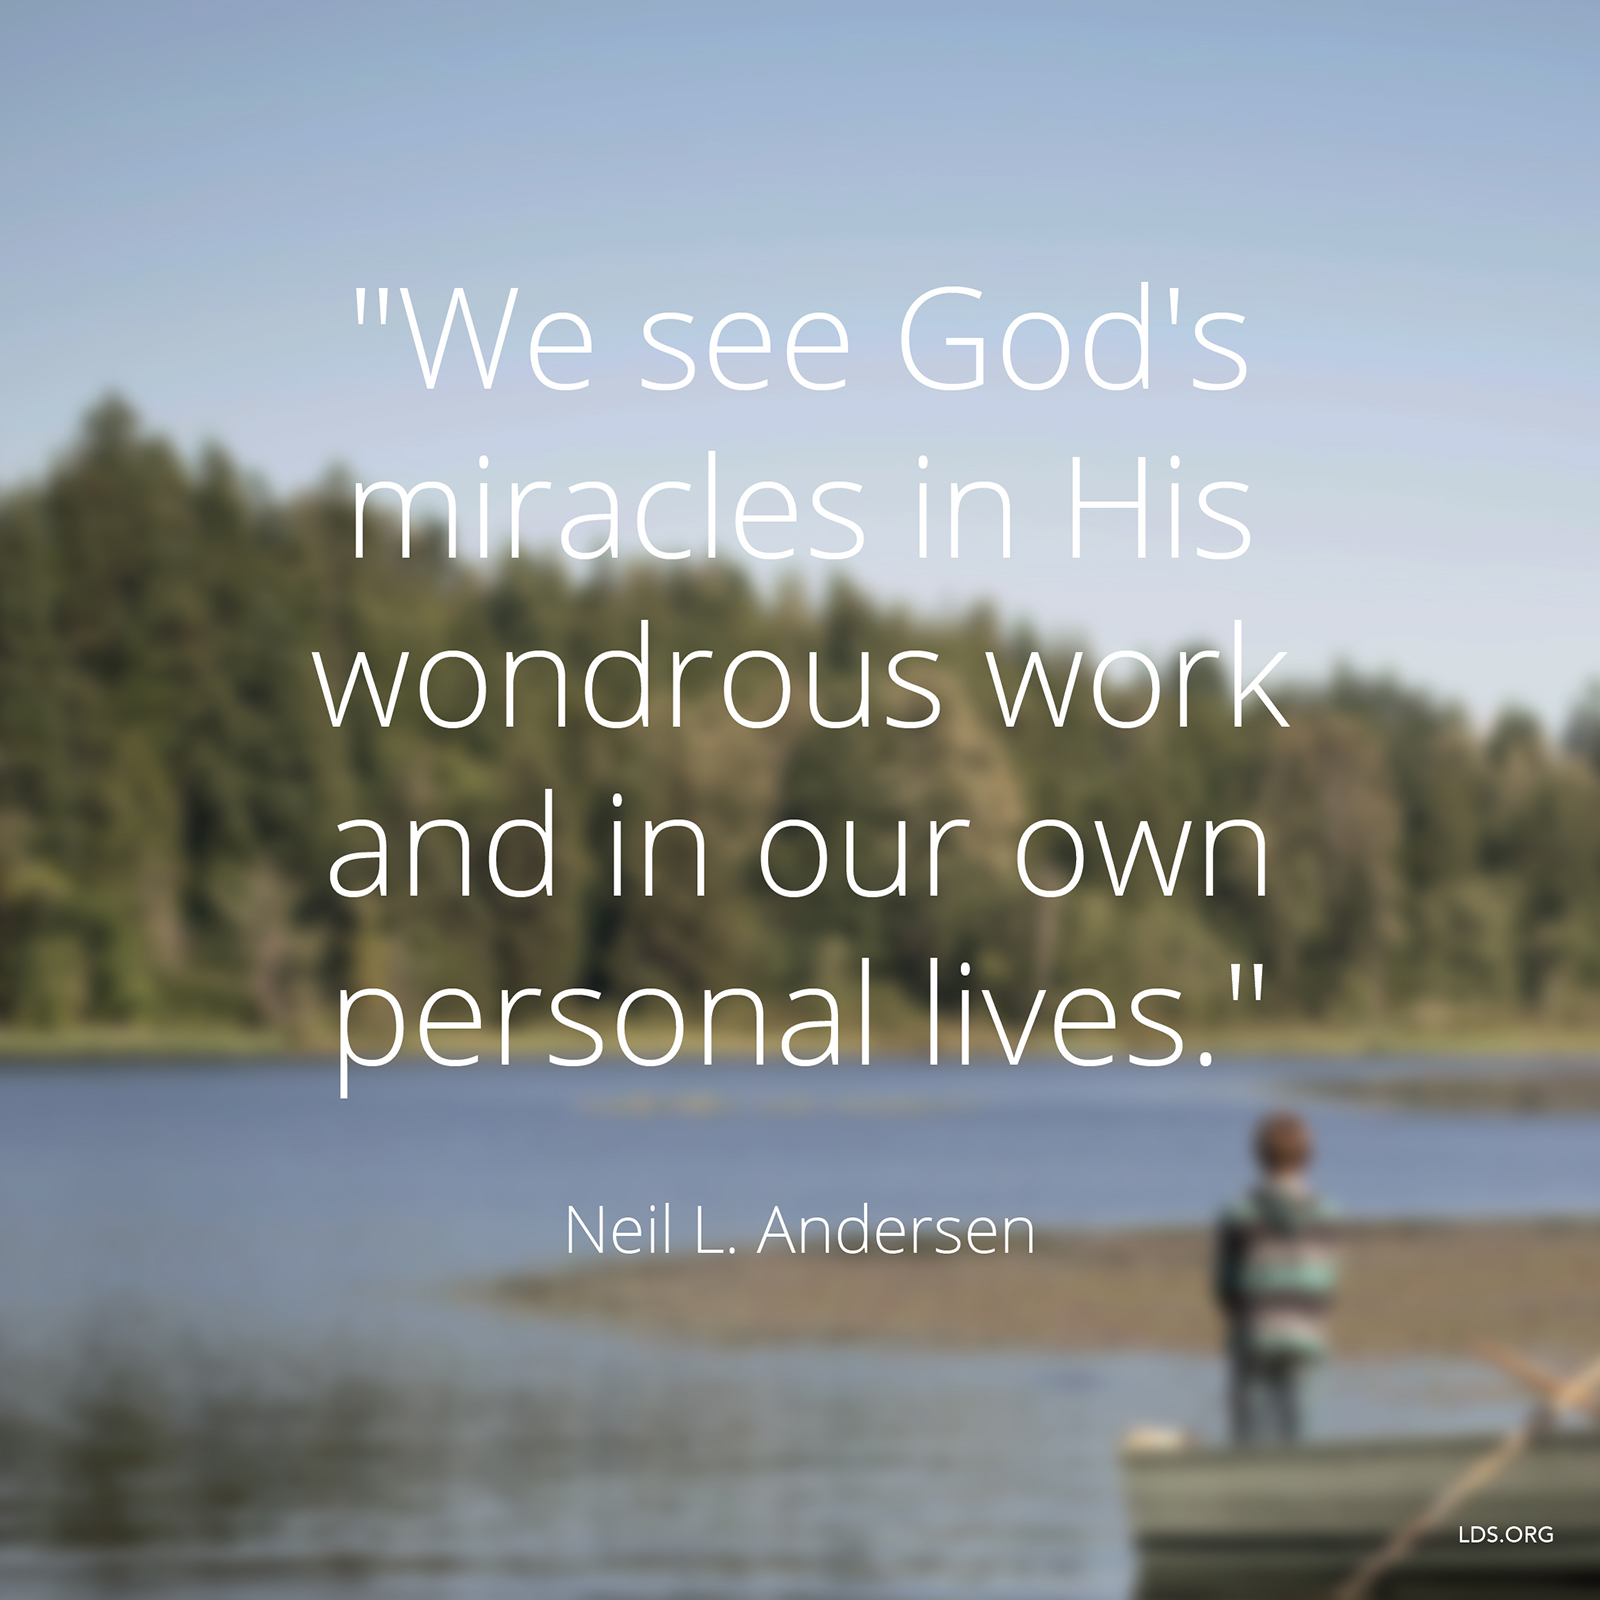 Motivational Inspirational Quotes: God's Wondrous Work